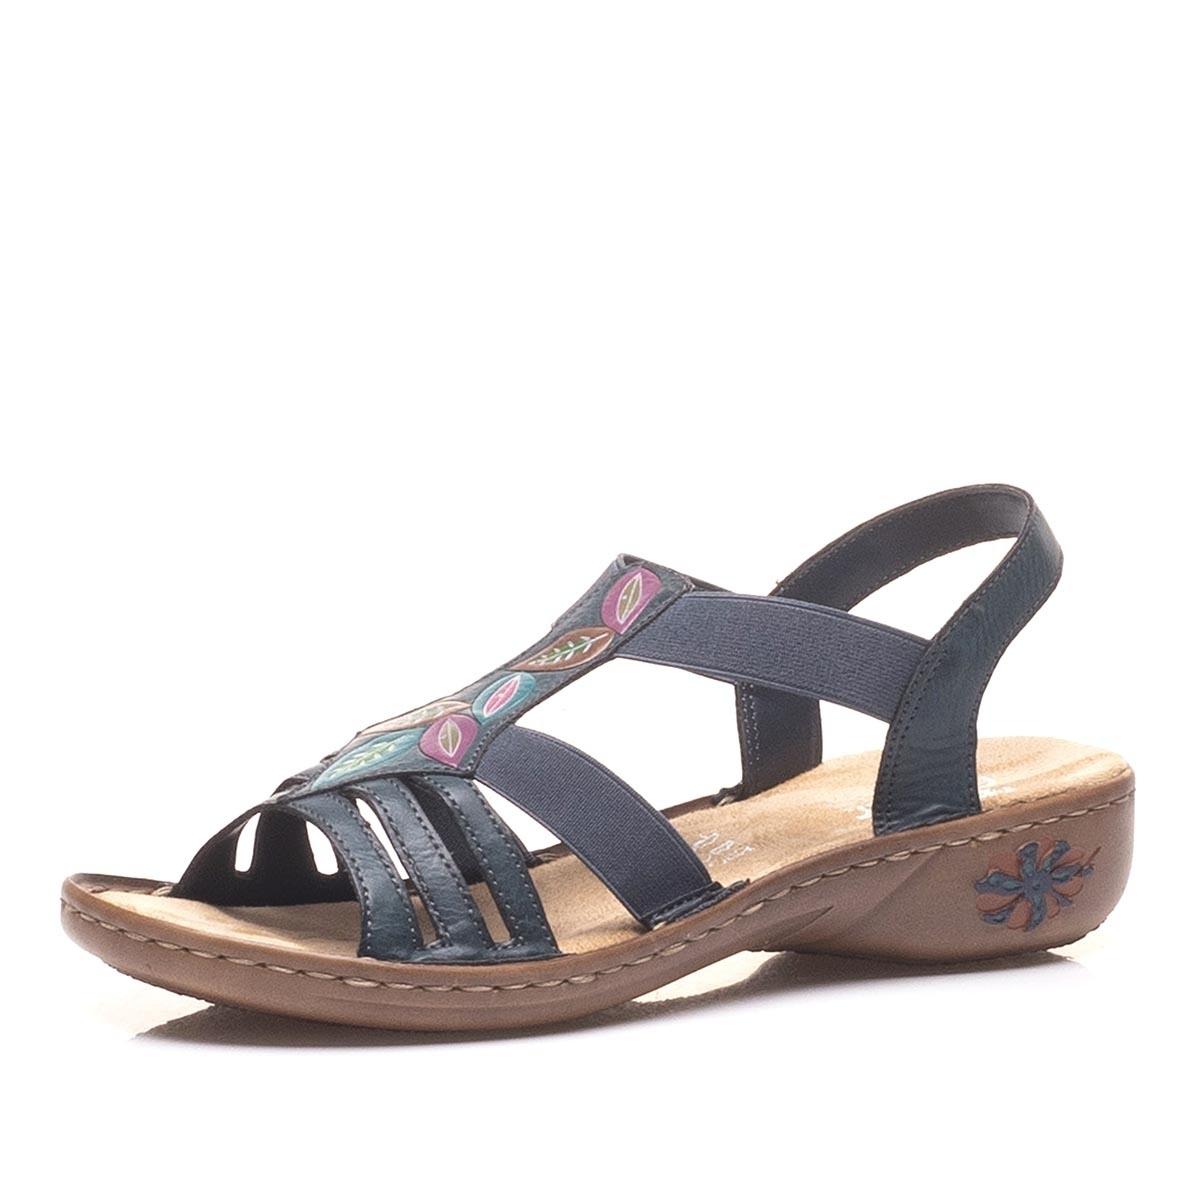 Dámská obuv RIEKER60171-14 BLAU F S 9  45931c3878